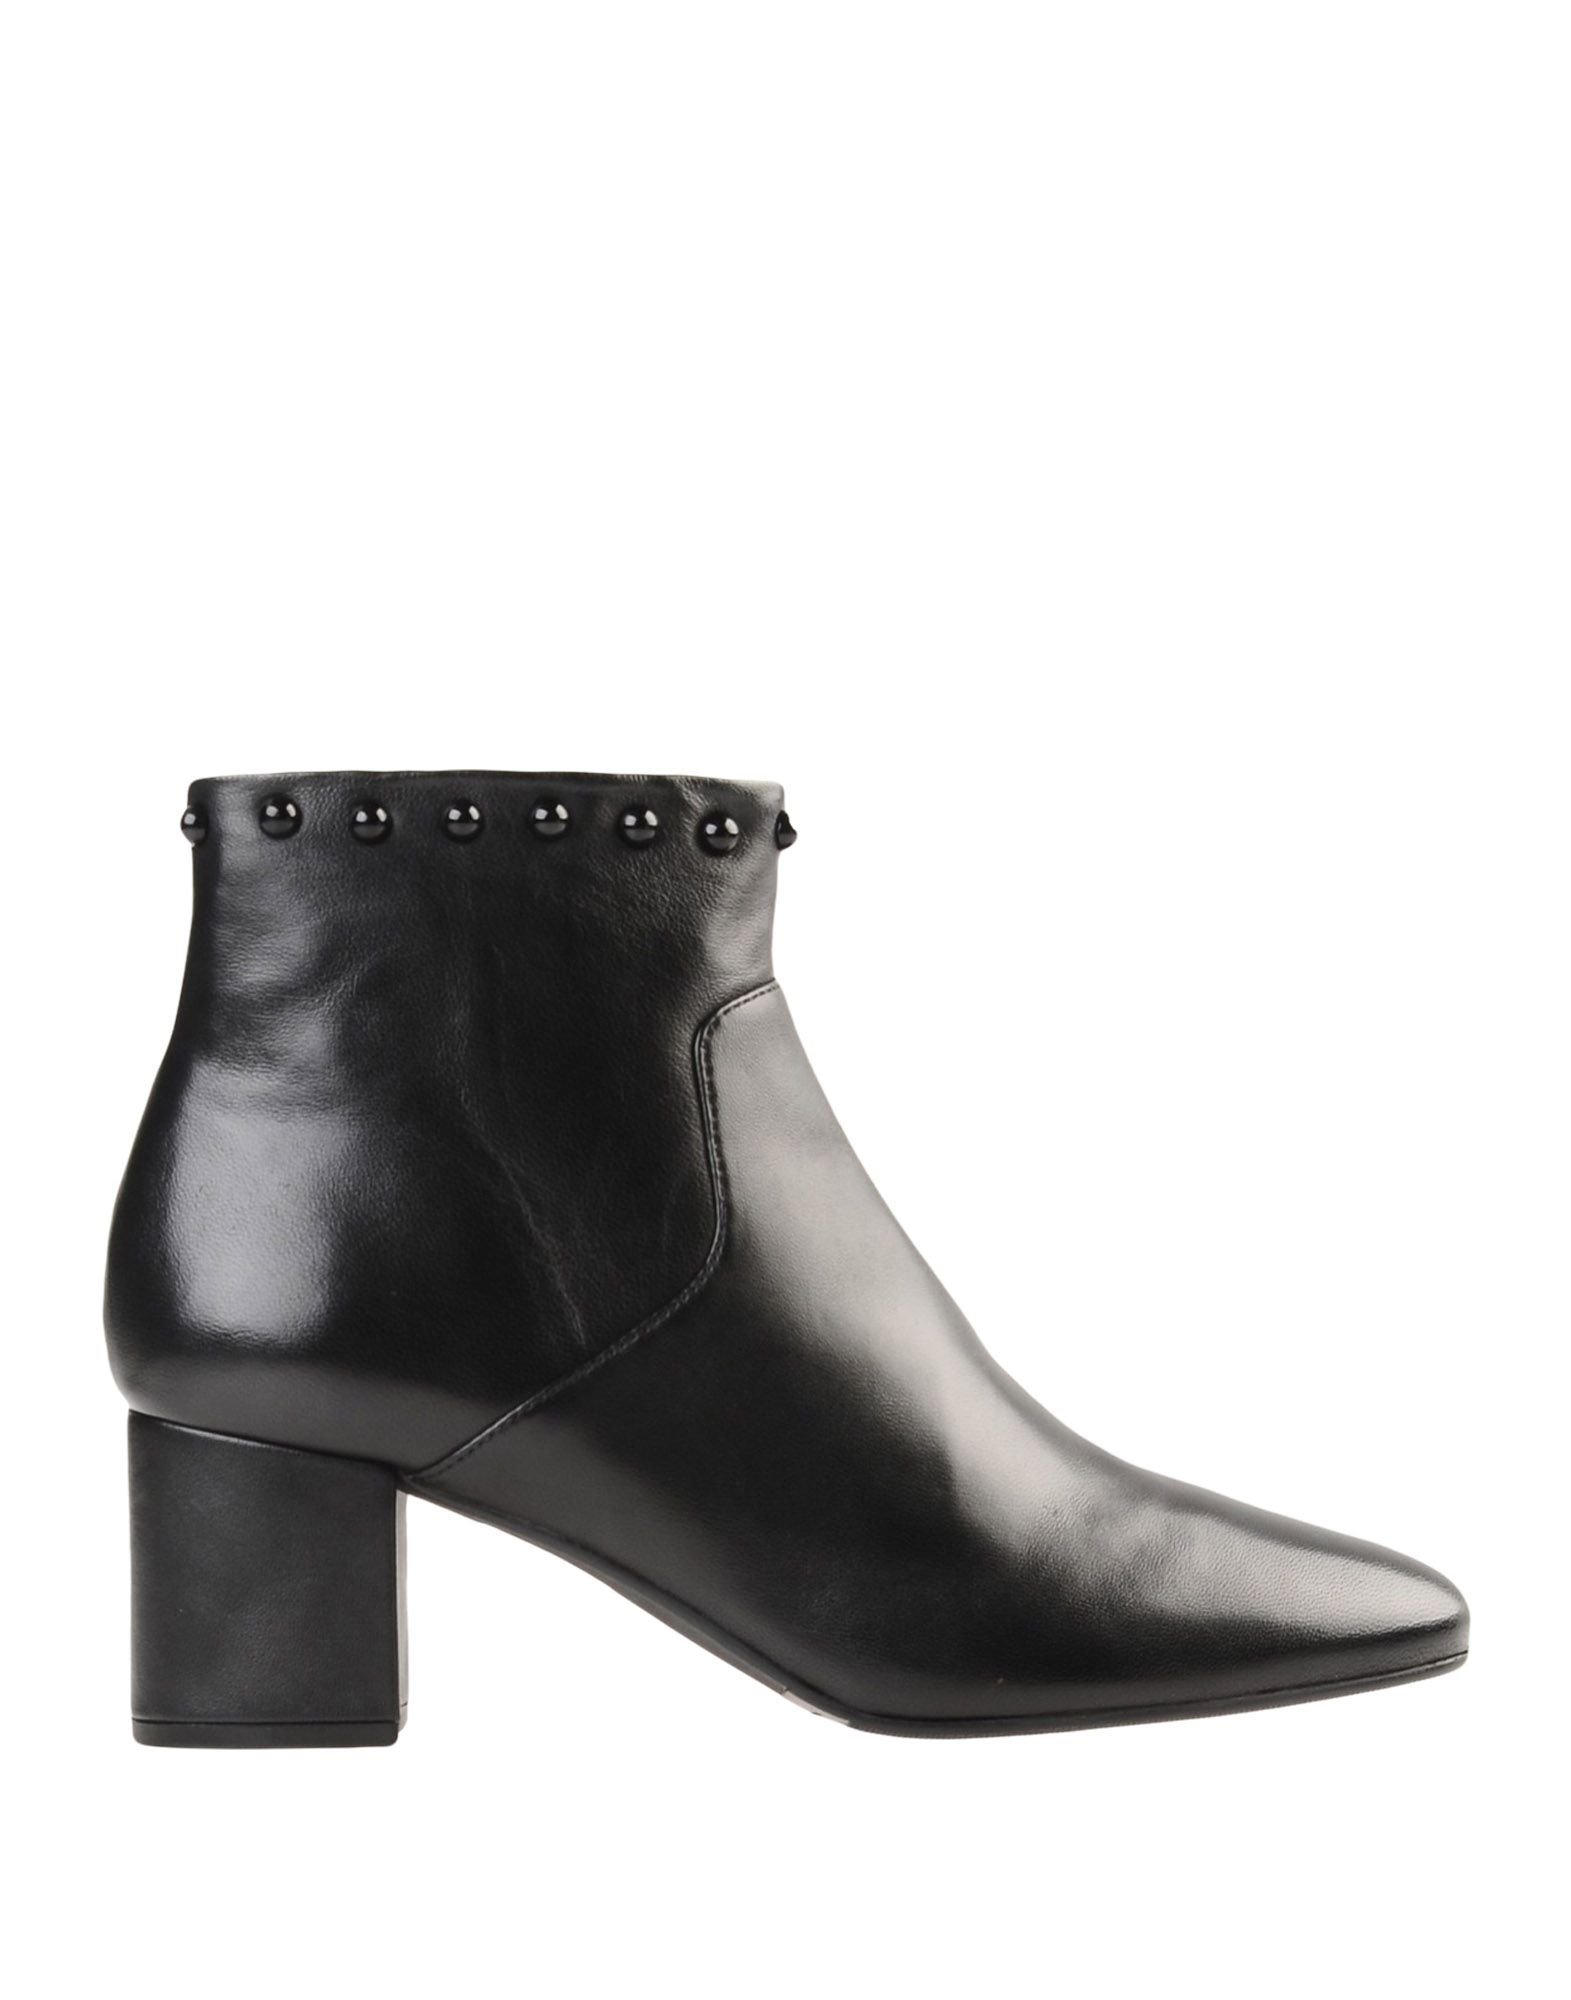 Bruno Premi Ankle Premi Boot - Women Bruno Premi Ankle Ankle Boots online on  Australia - 11538768OJ c0af80